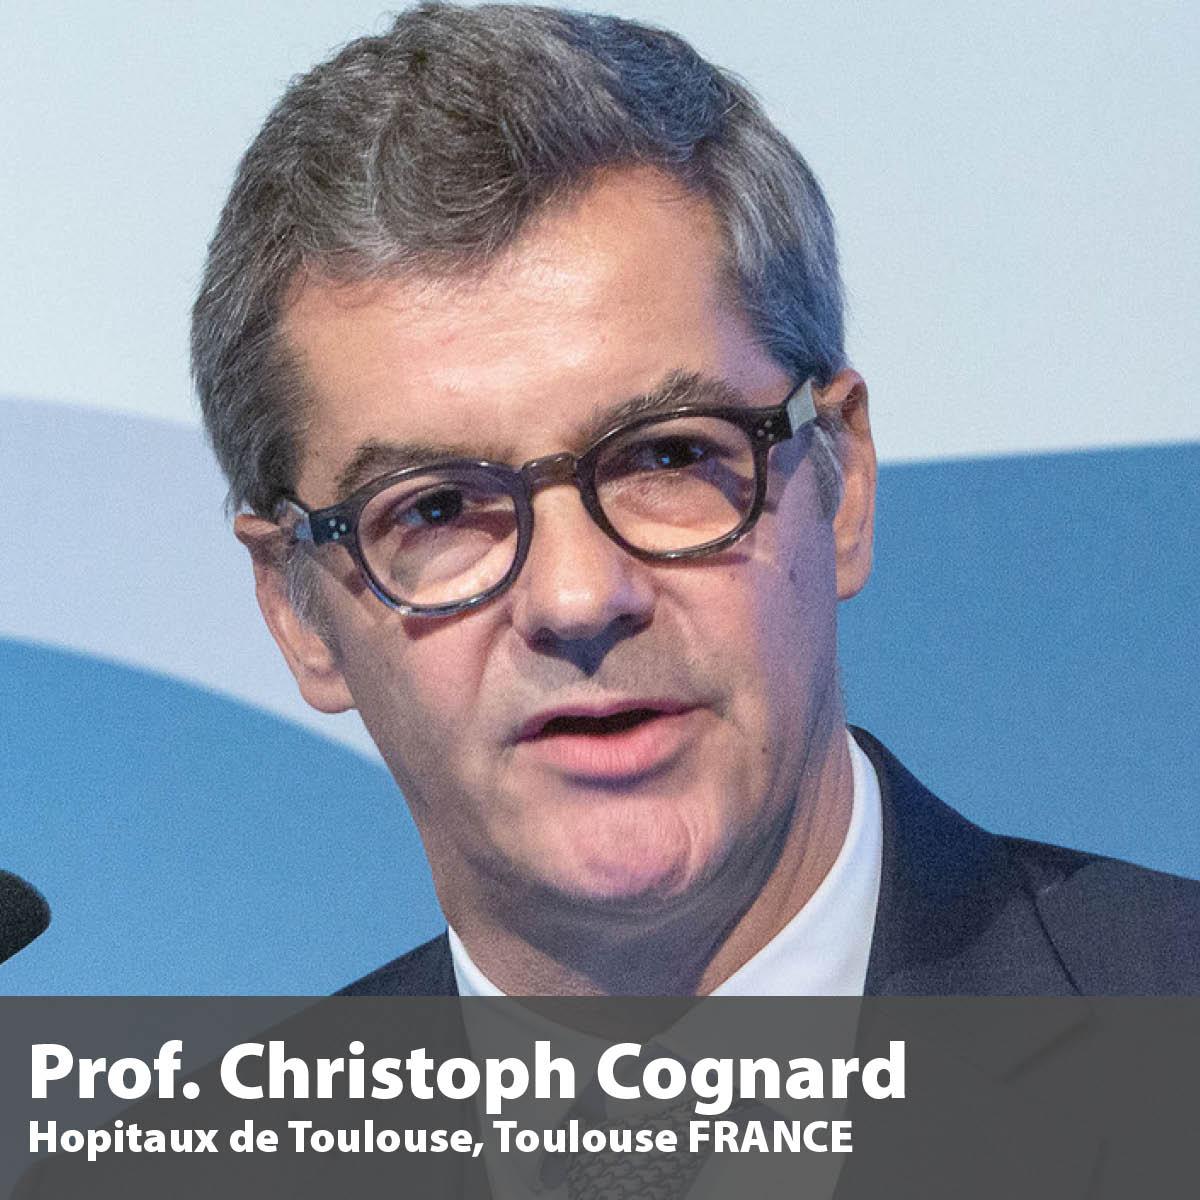 Mentor Christophe Cognard